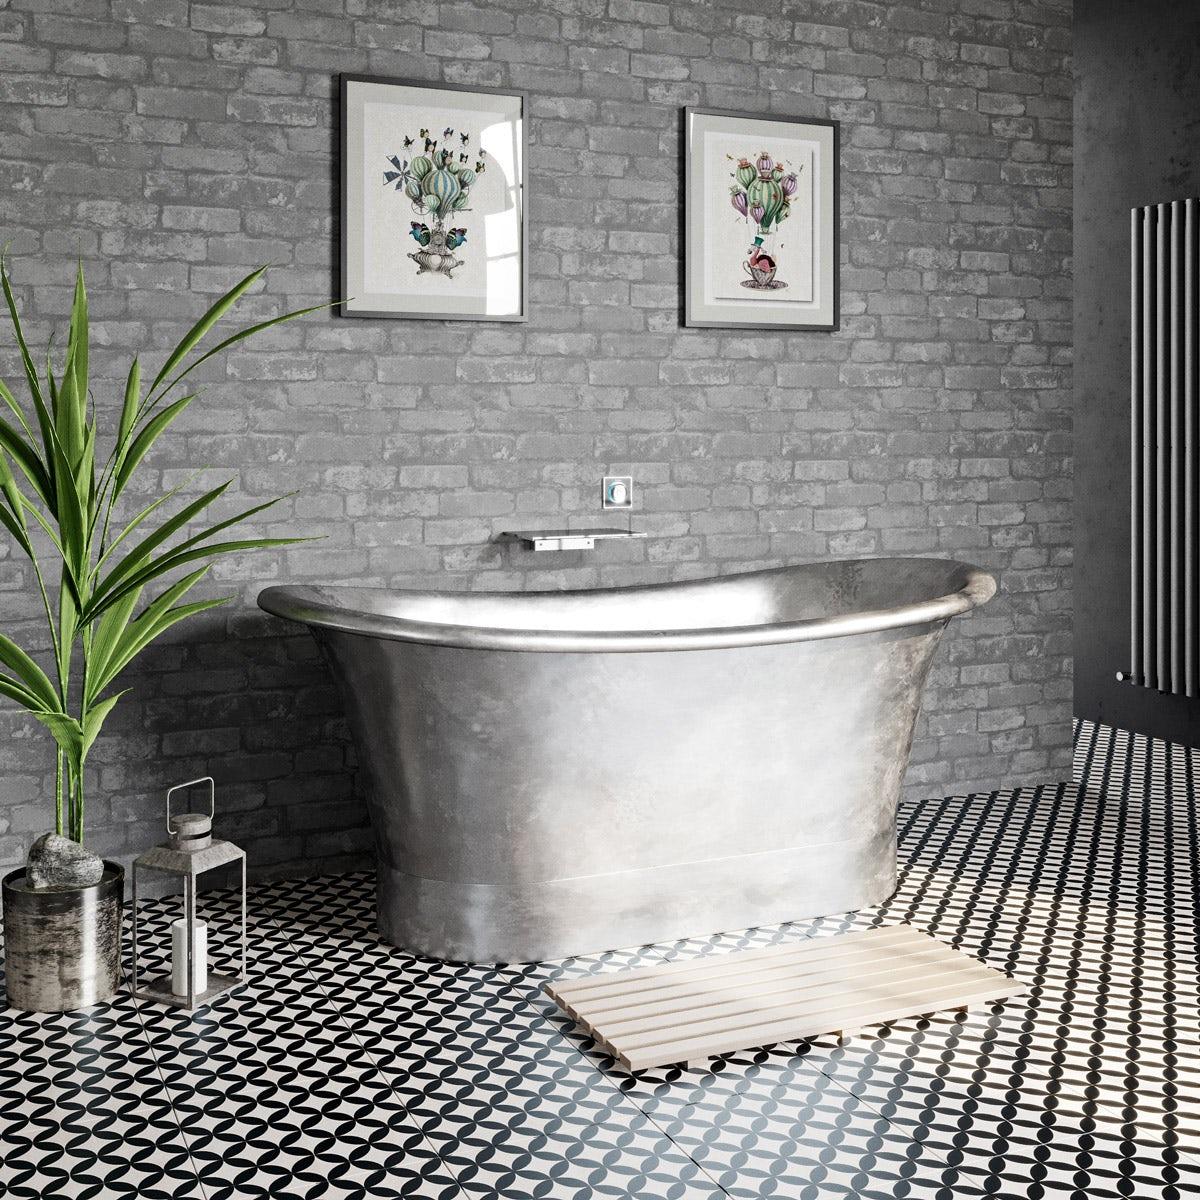 bathroom wallpaper. Fine Decor Rustic Brick Sidewall Cream Grey Wallpaper Bathroom S